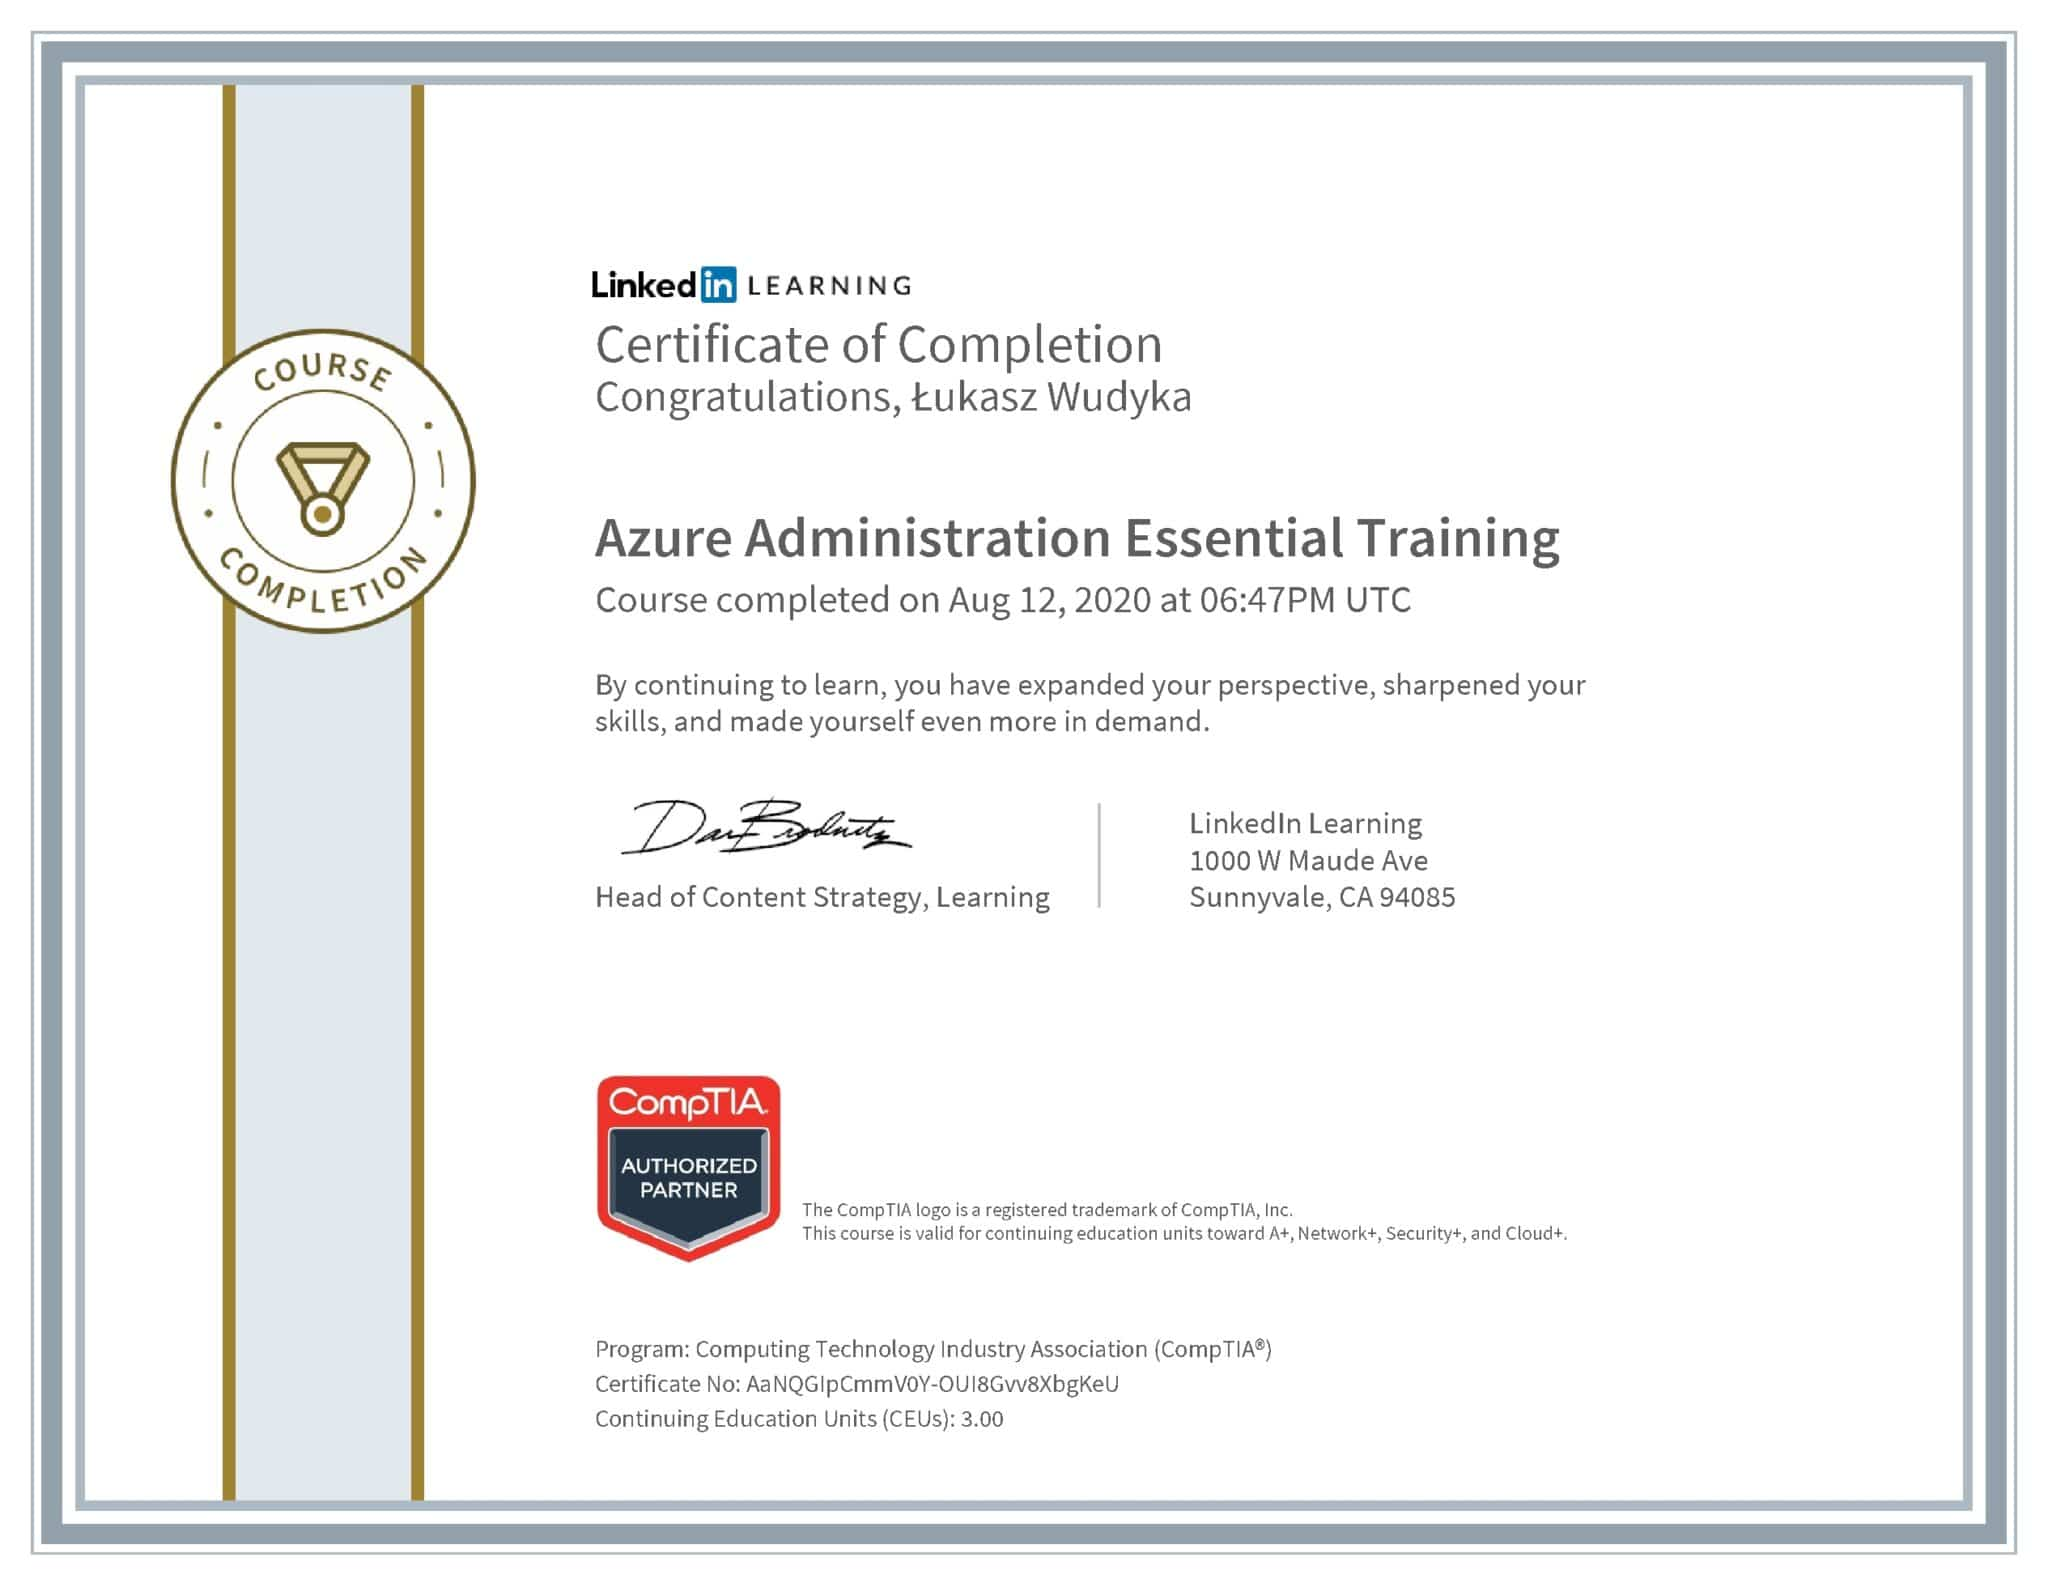 Łukasz Wudyka certyfikat LinkedIn Azure Administration Essential Training CompTIA